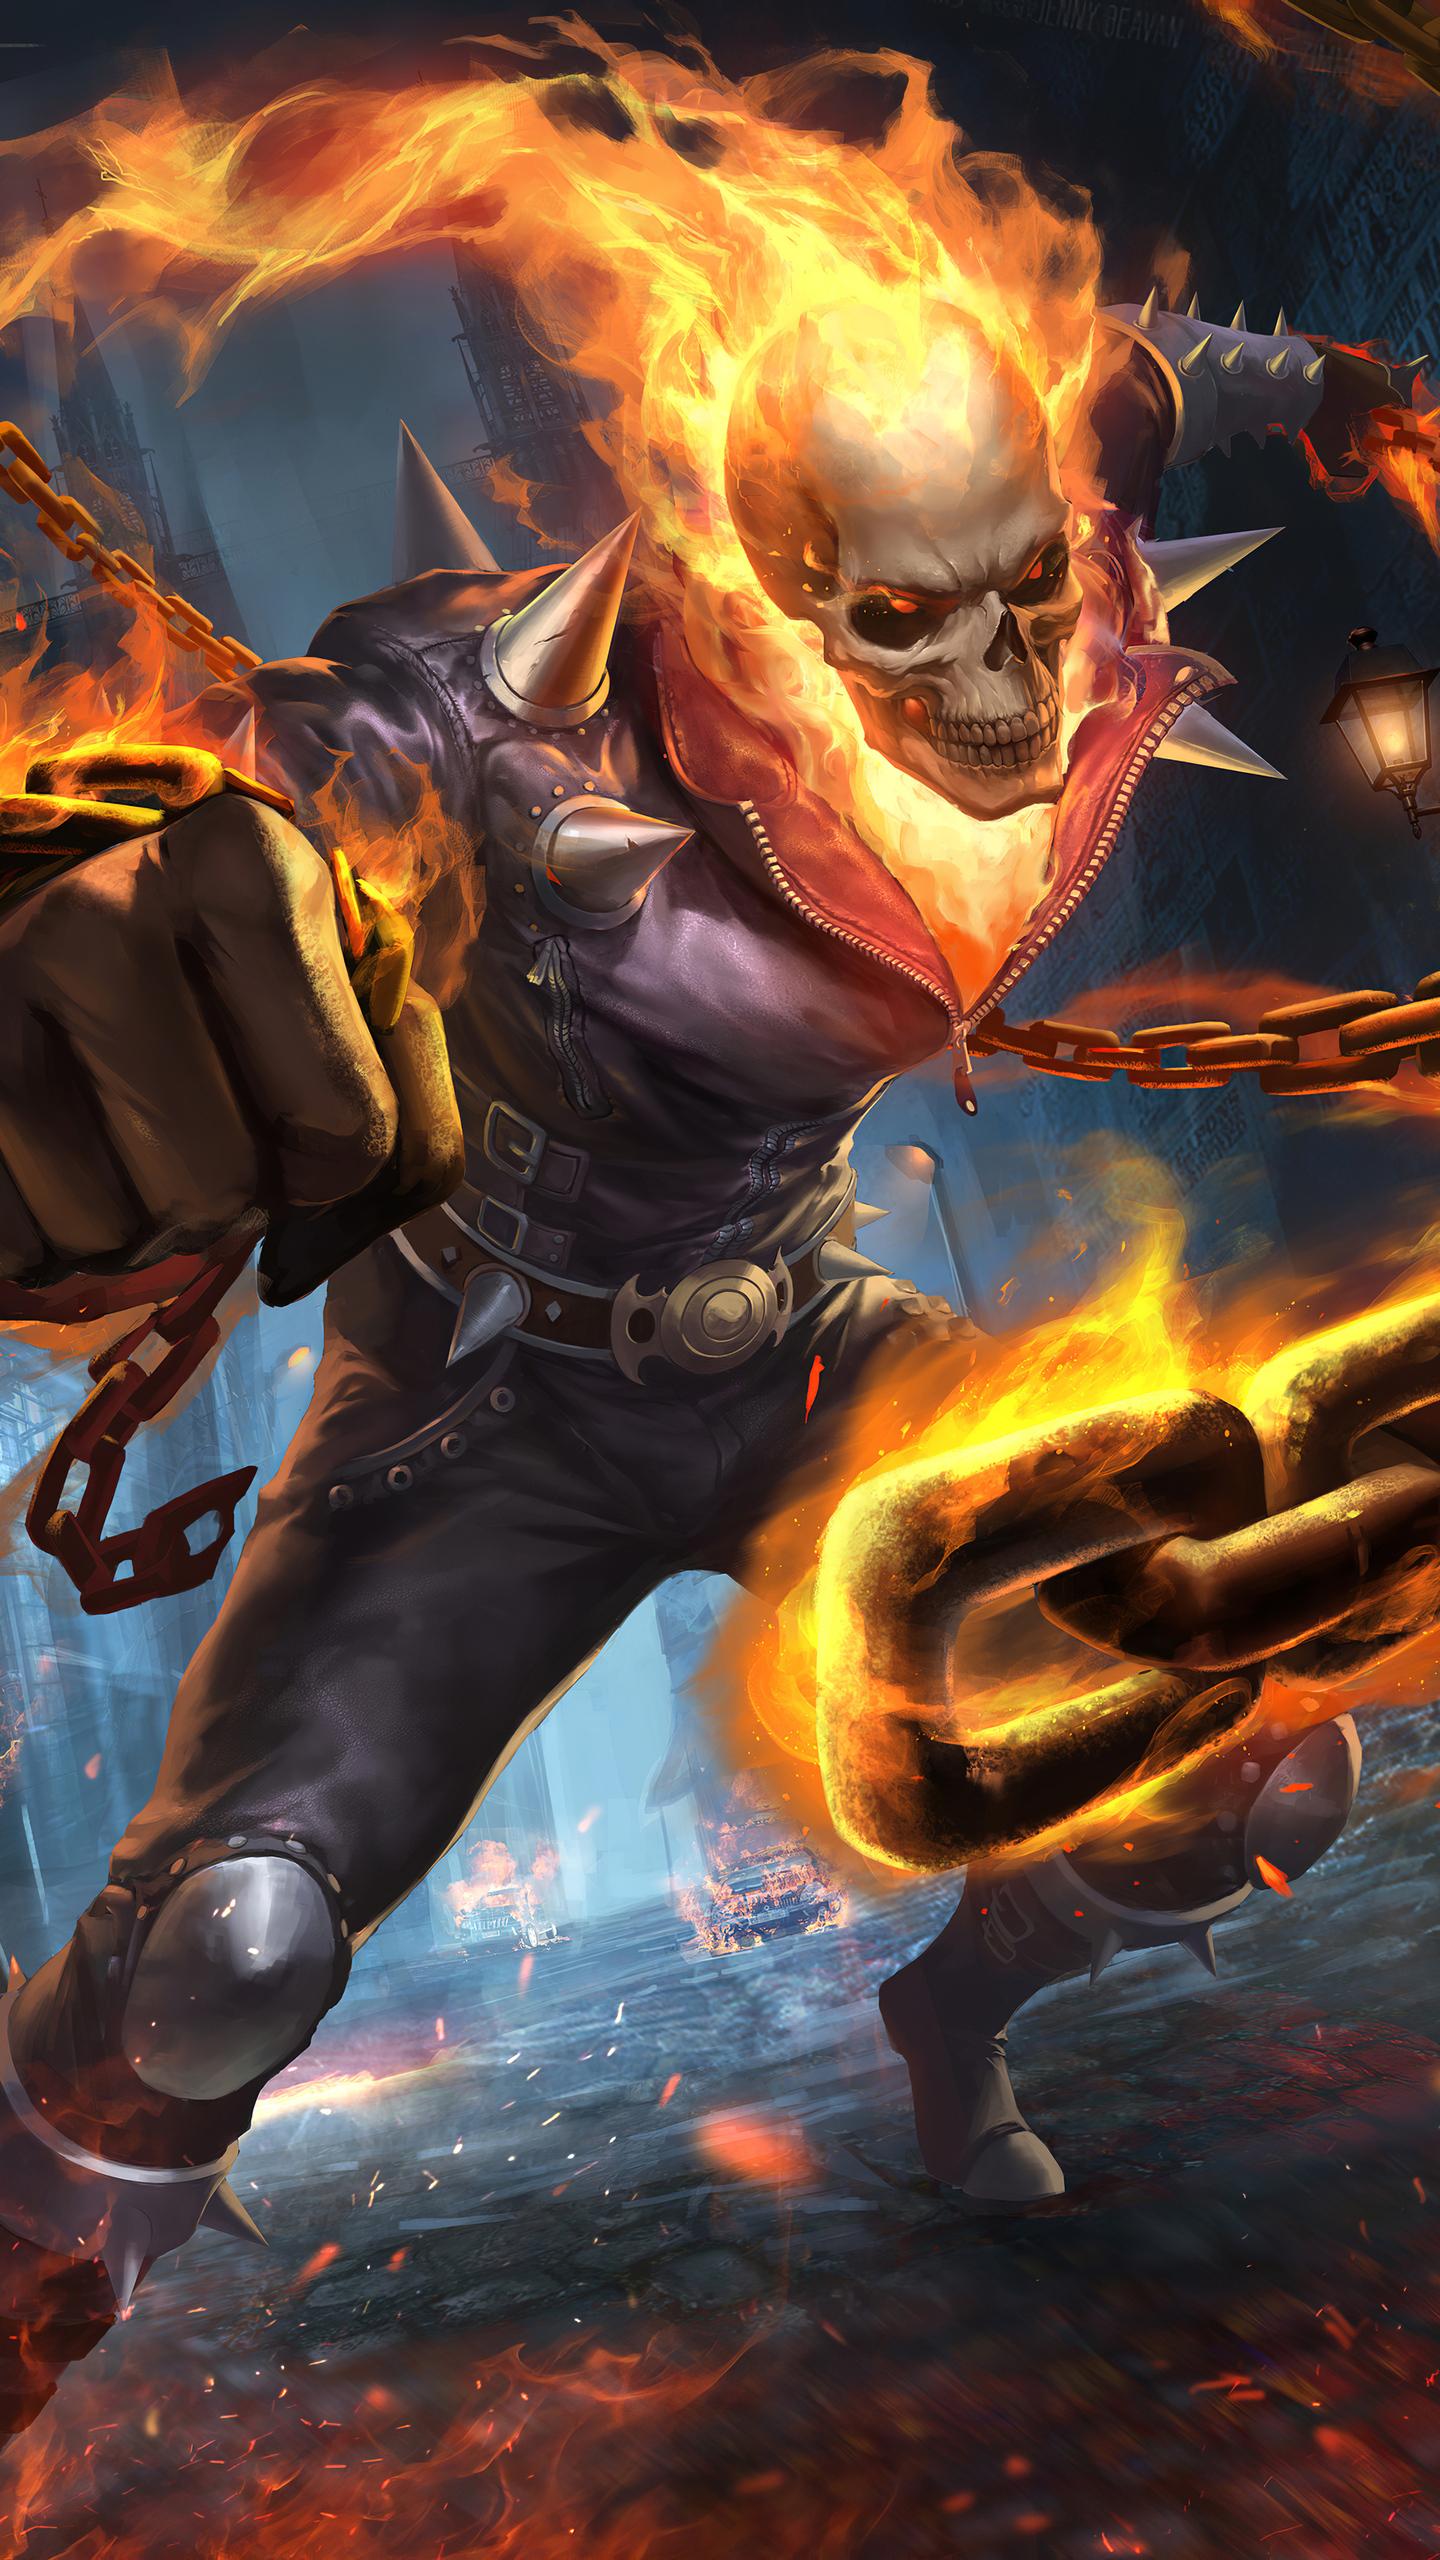 ghost-rider-4k-2020-y3.jpg